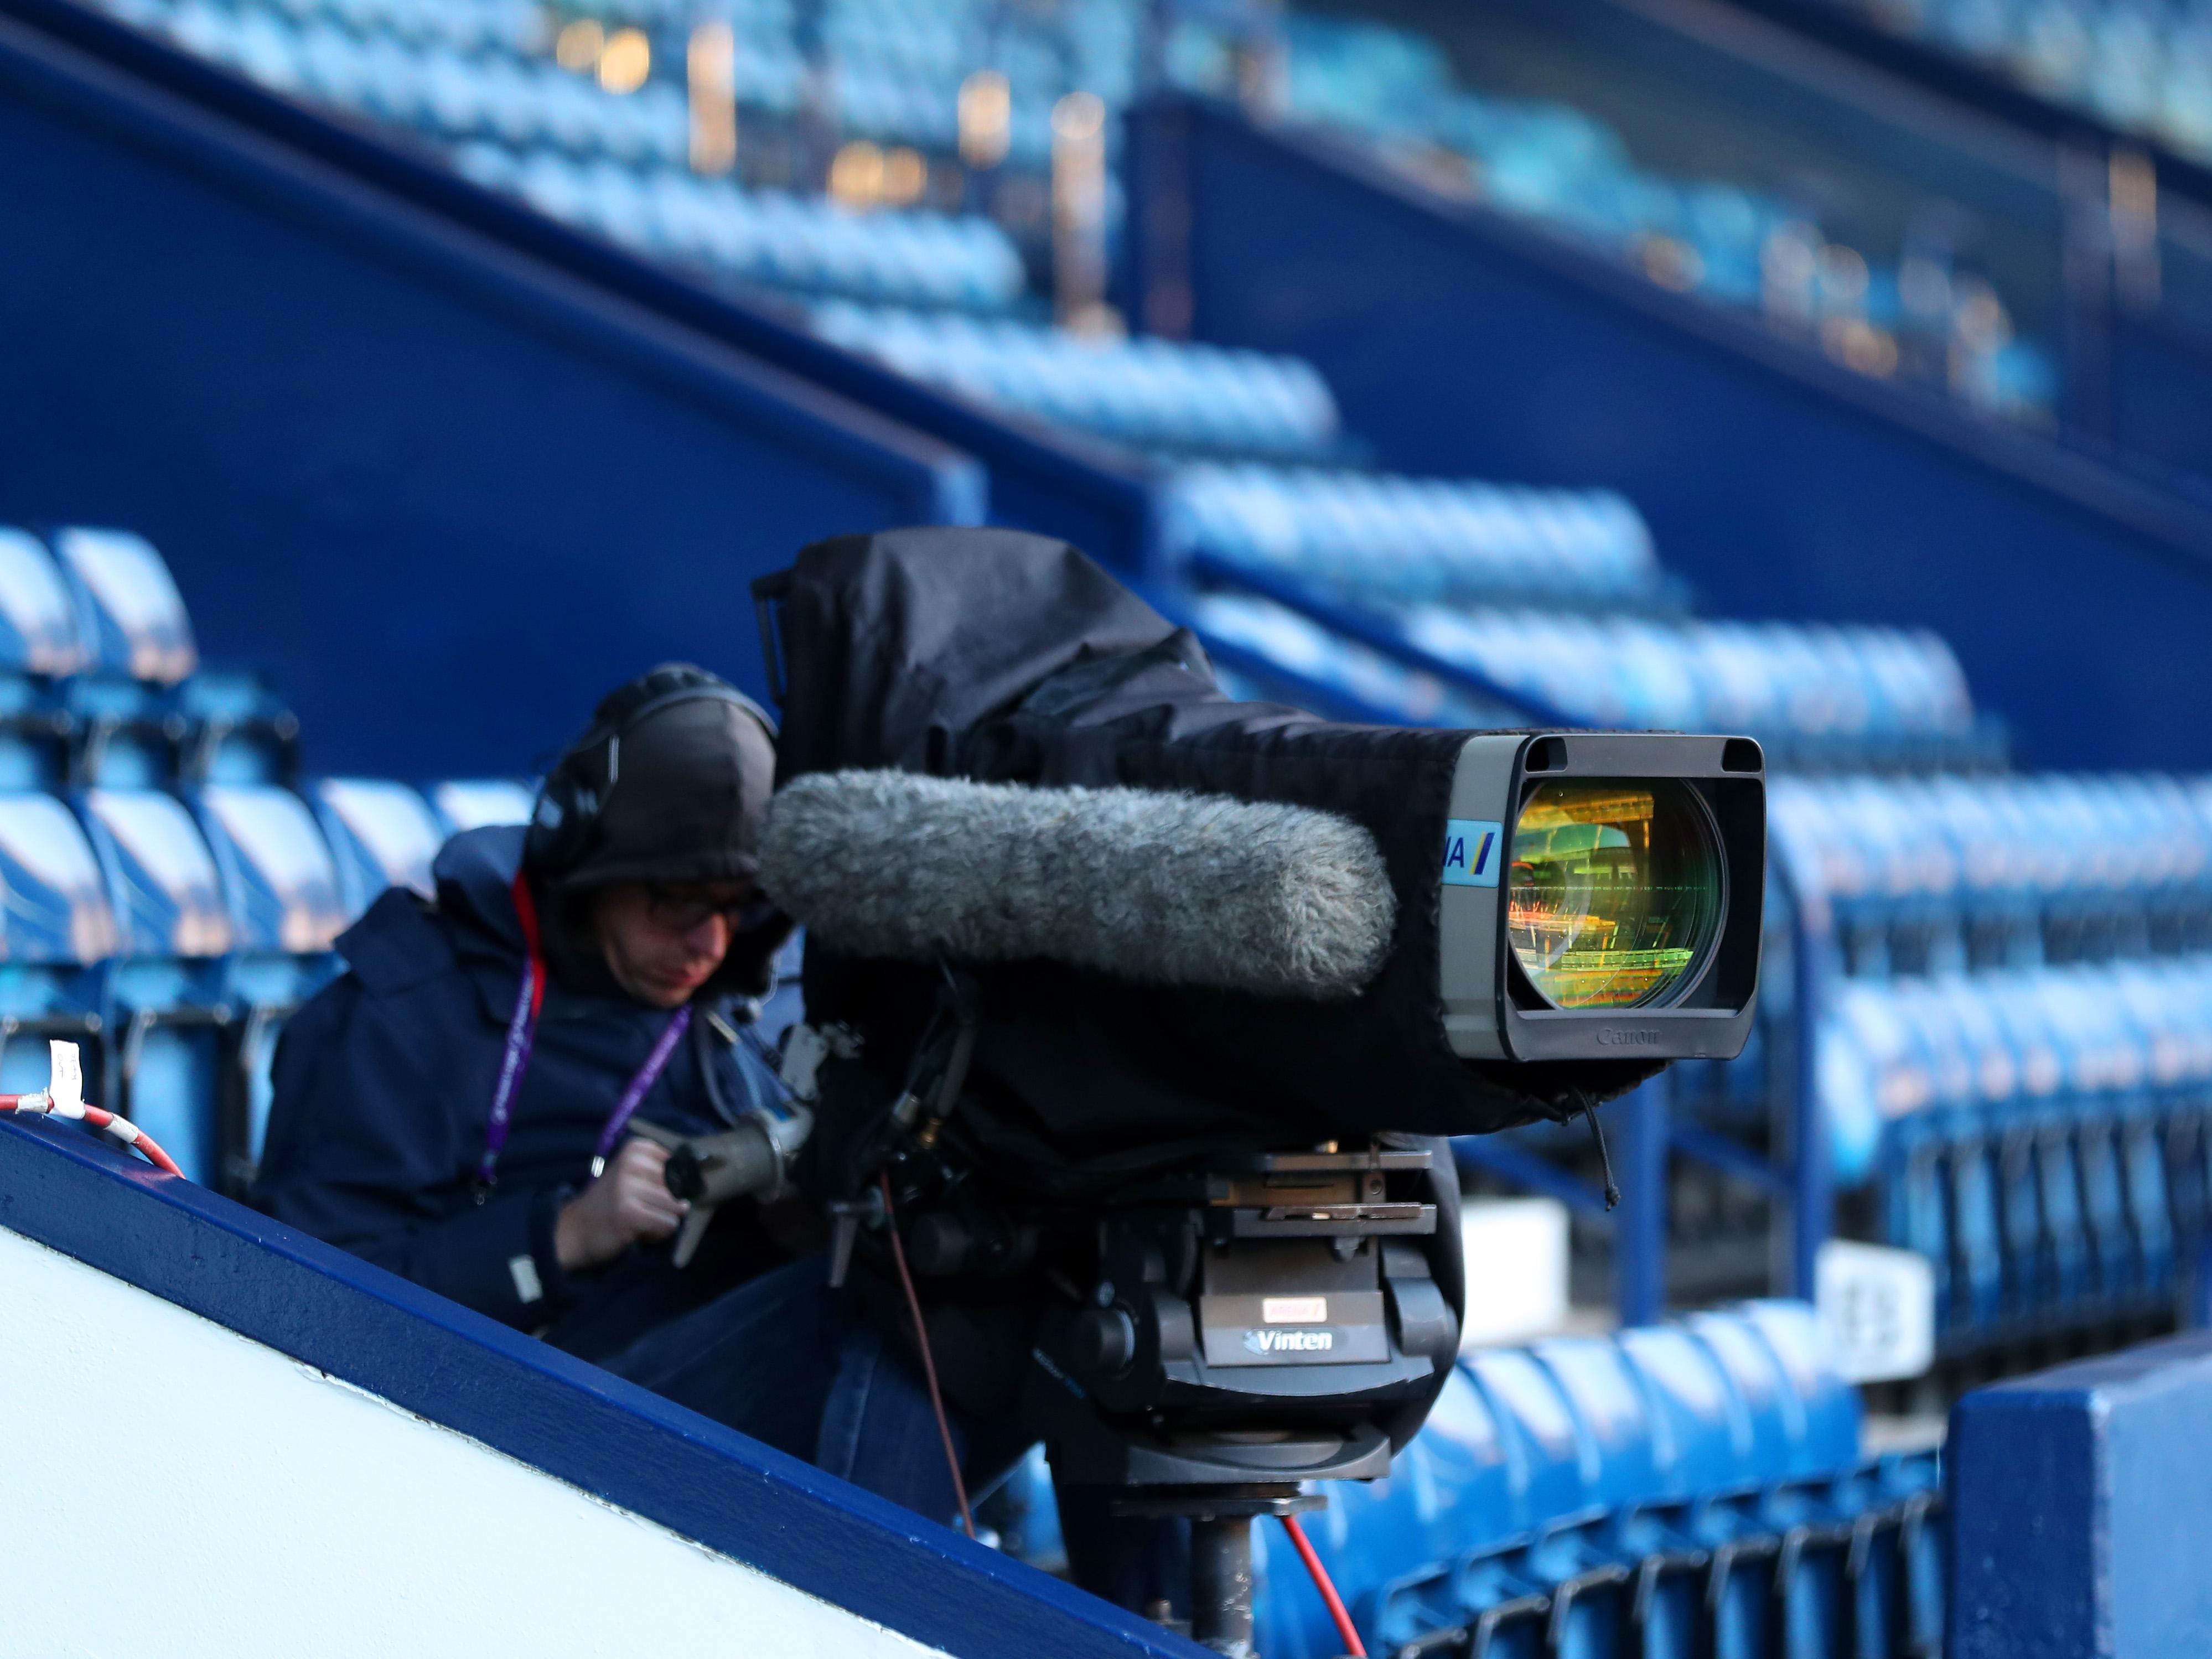 TV camera operator